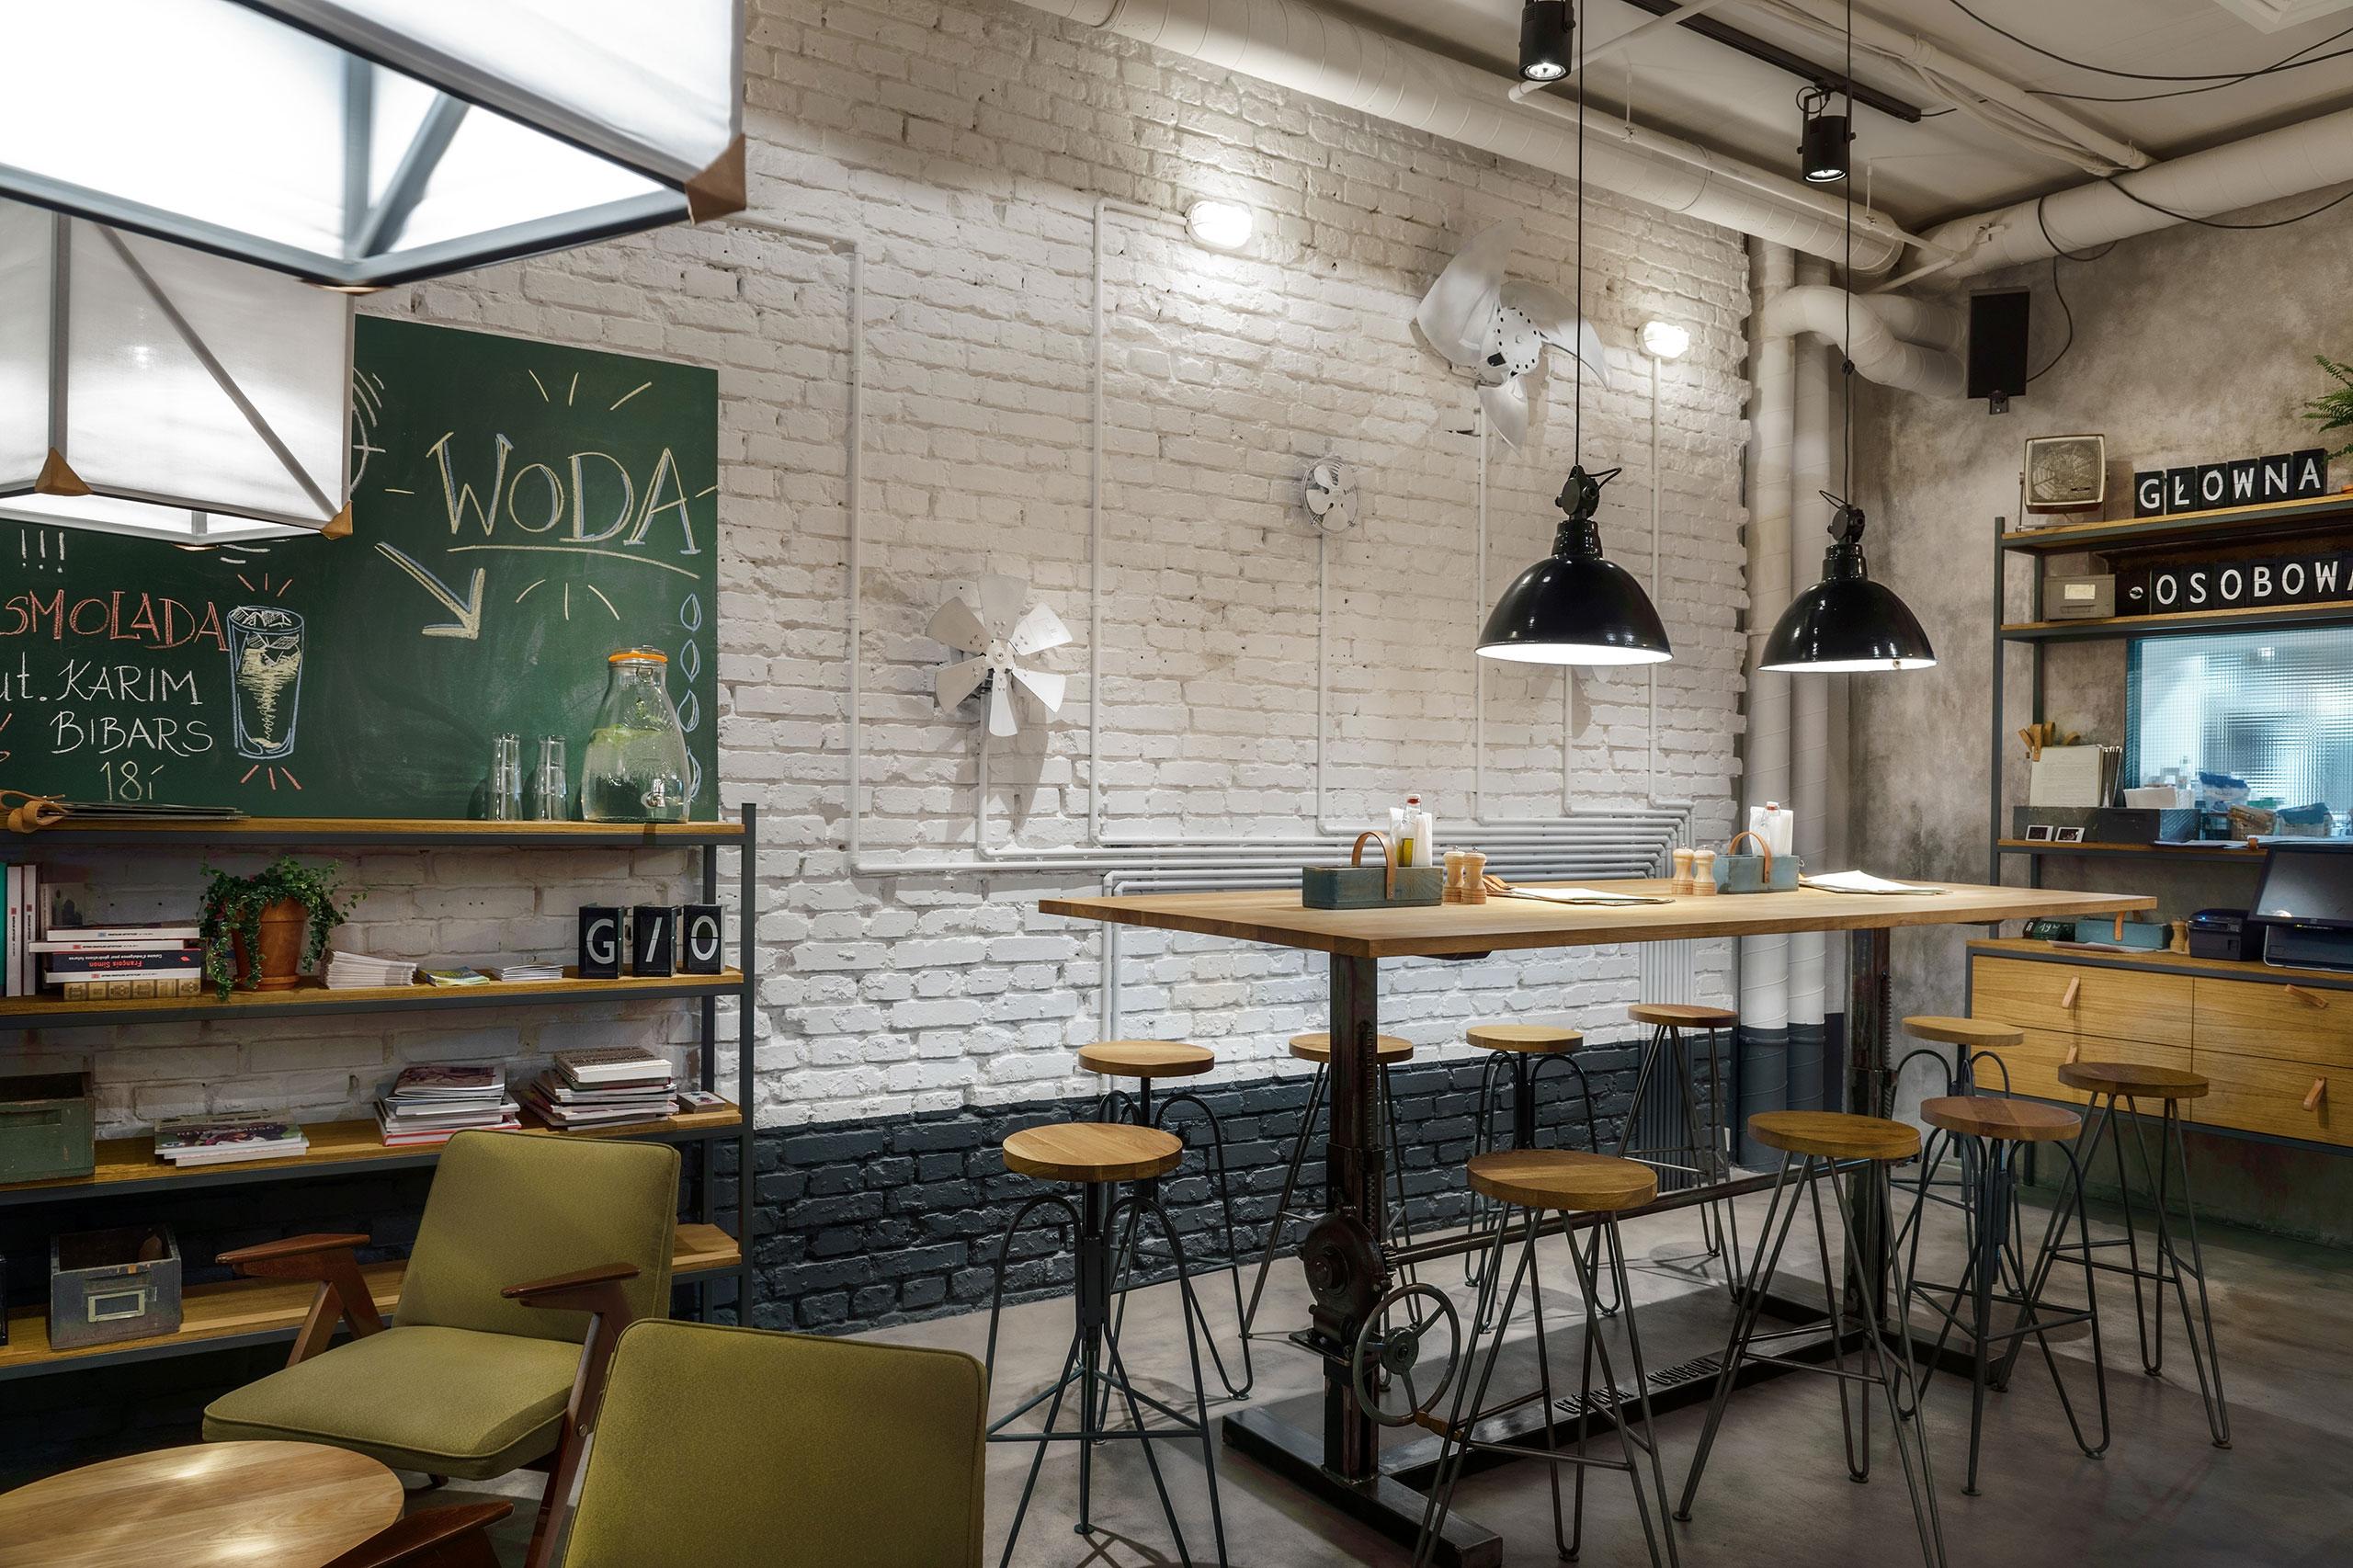 gowna osobowa bar by pbstudio and filip kozarsk 10 Główna Osobowa bar by PB/STUDIO and Filip Kozarsk